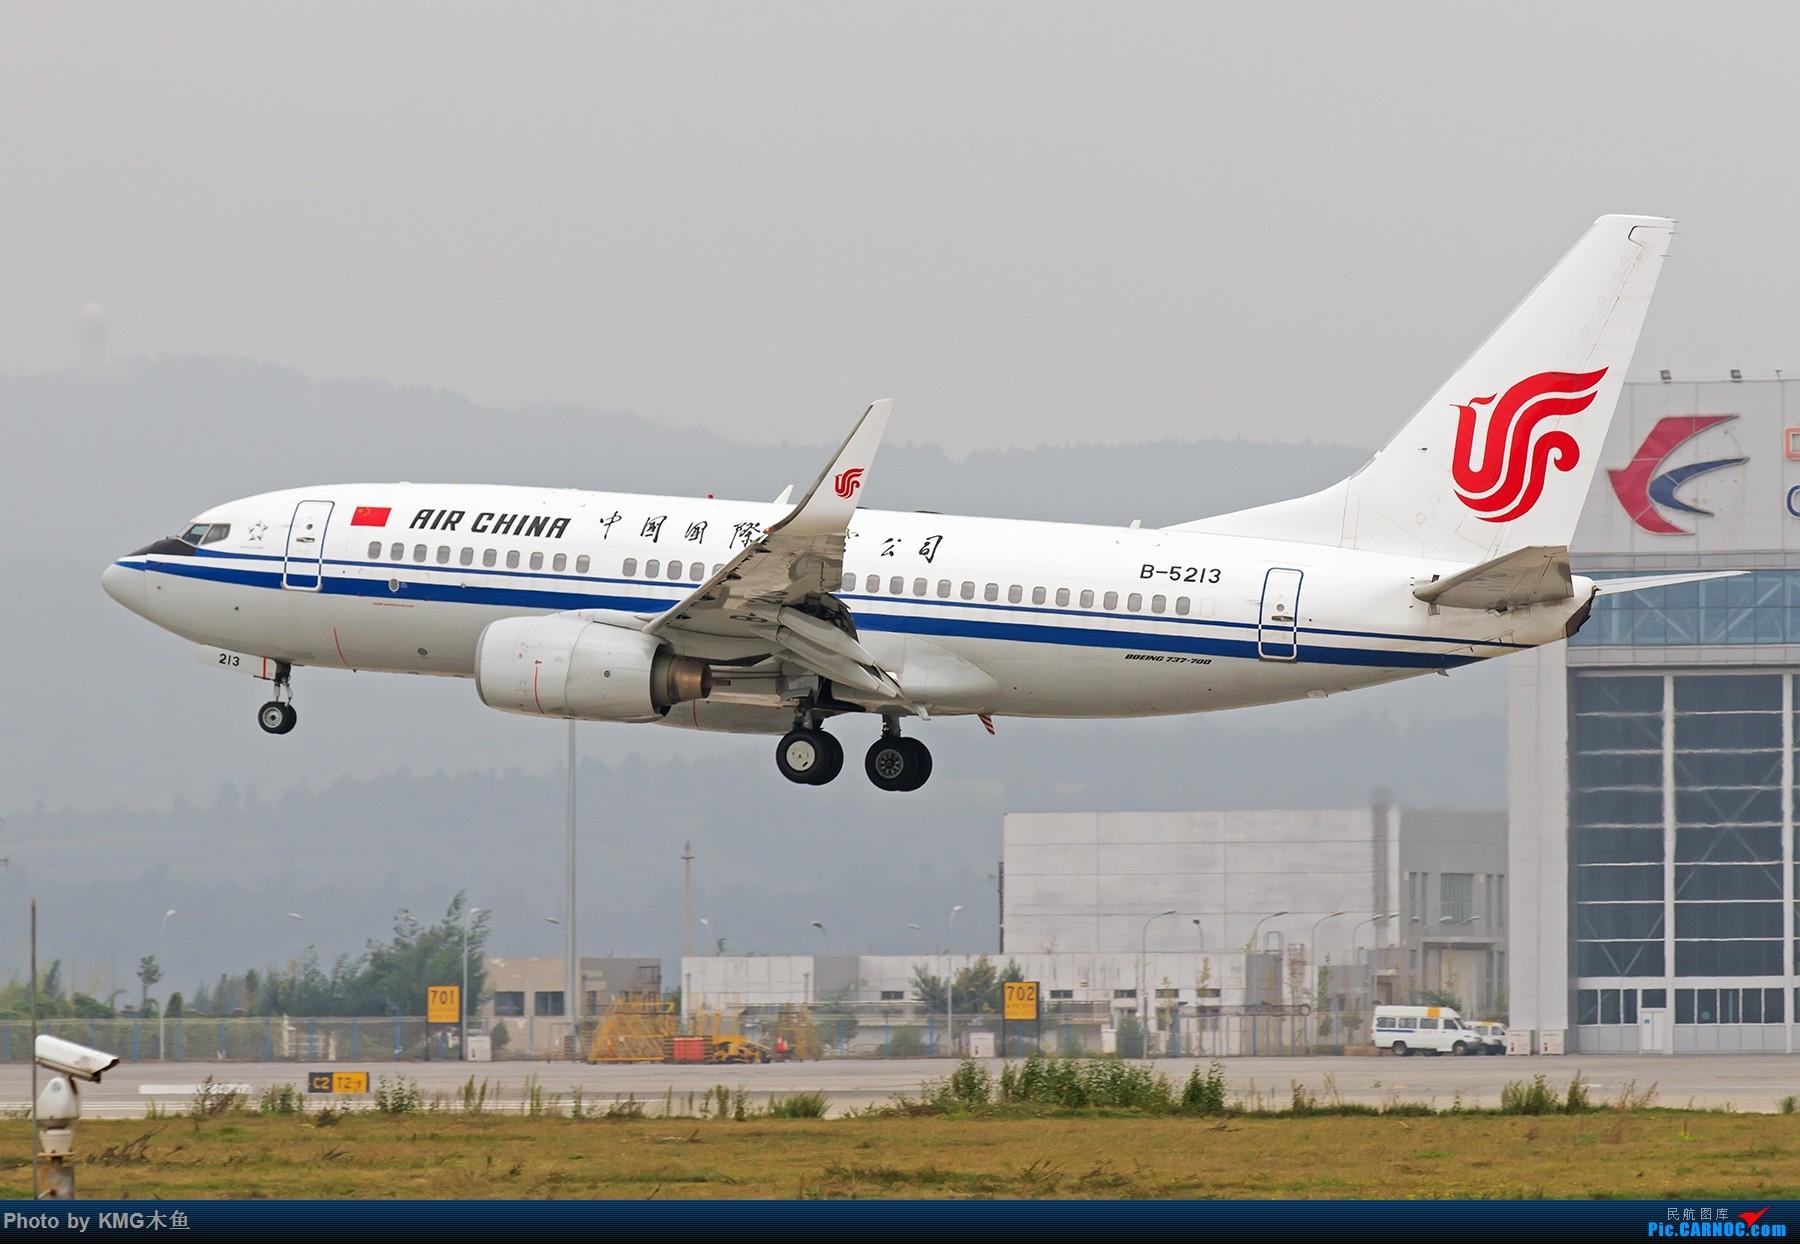 Re:[原创]【C47运输机KMG木鱼木有拍到】烂天有好货,好货在内场,嘻嘻 BOEING 737-700 B-5213 中国昆明长水国际机场